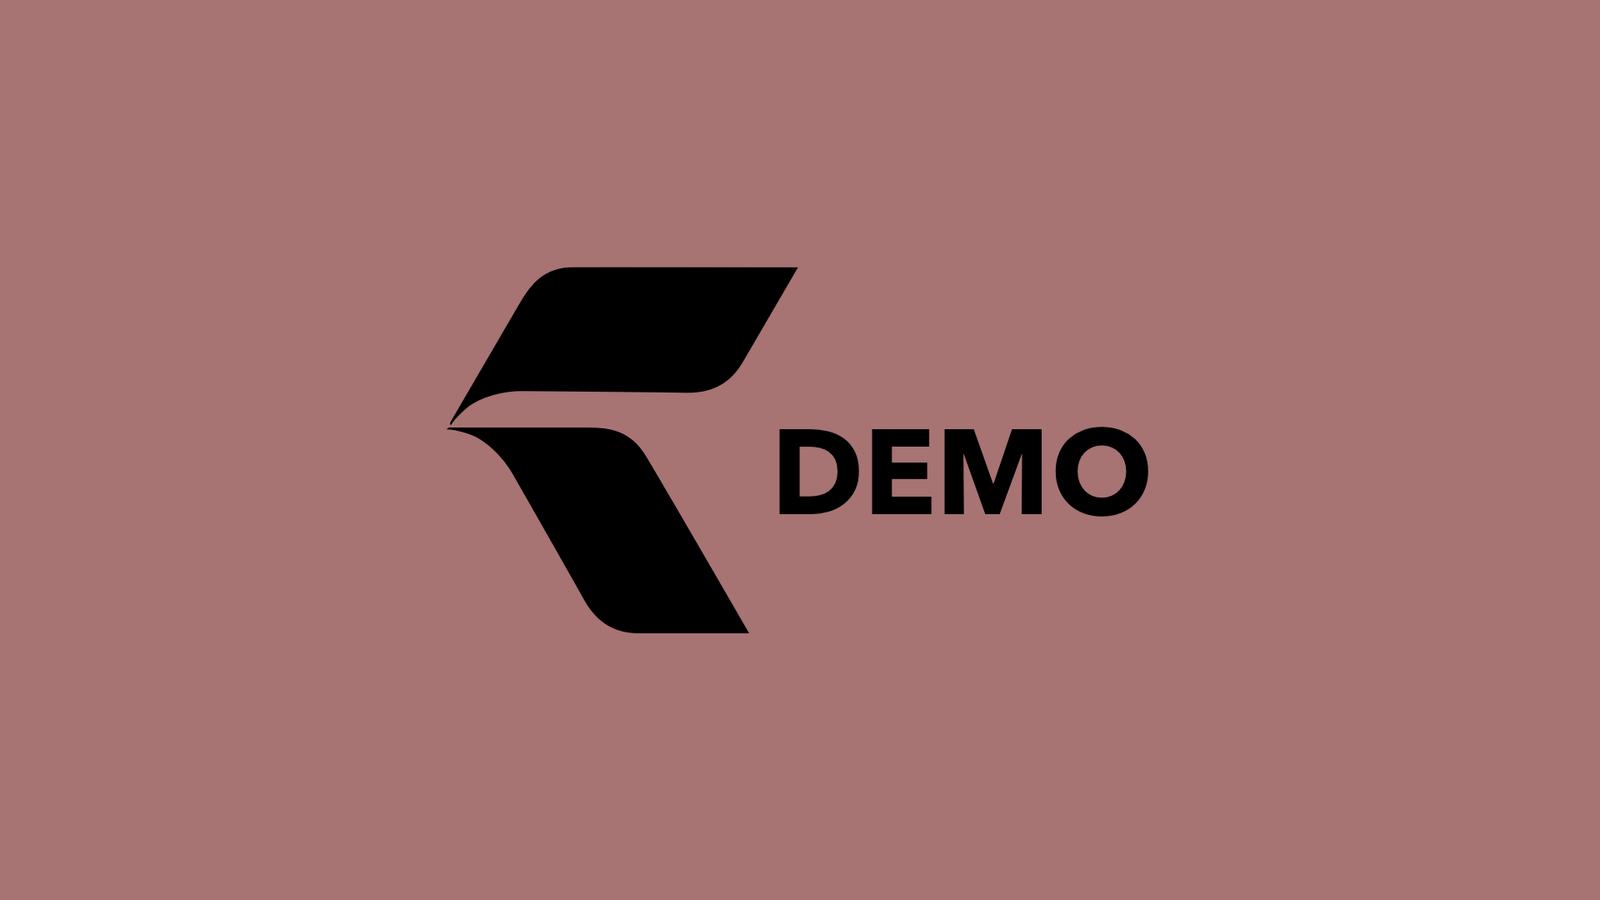 Welcome to the Kinja Demo! Red